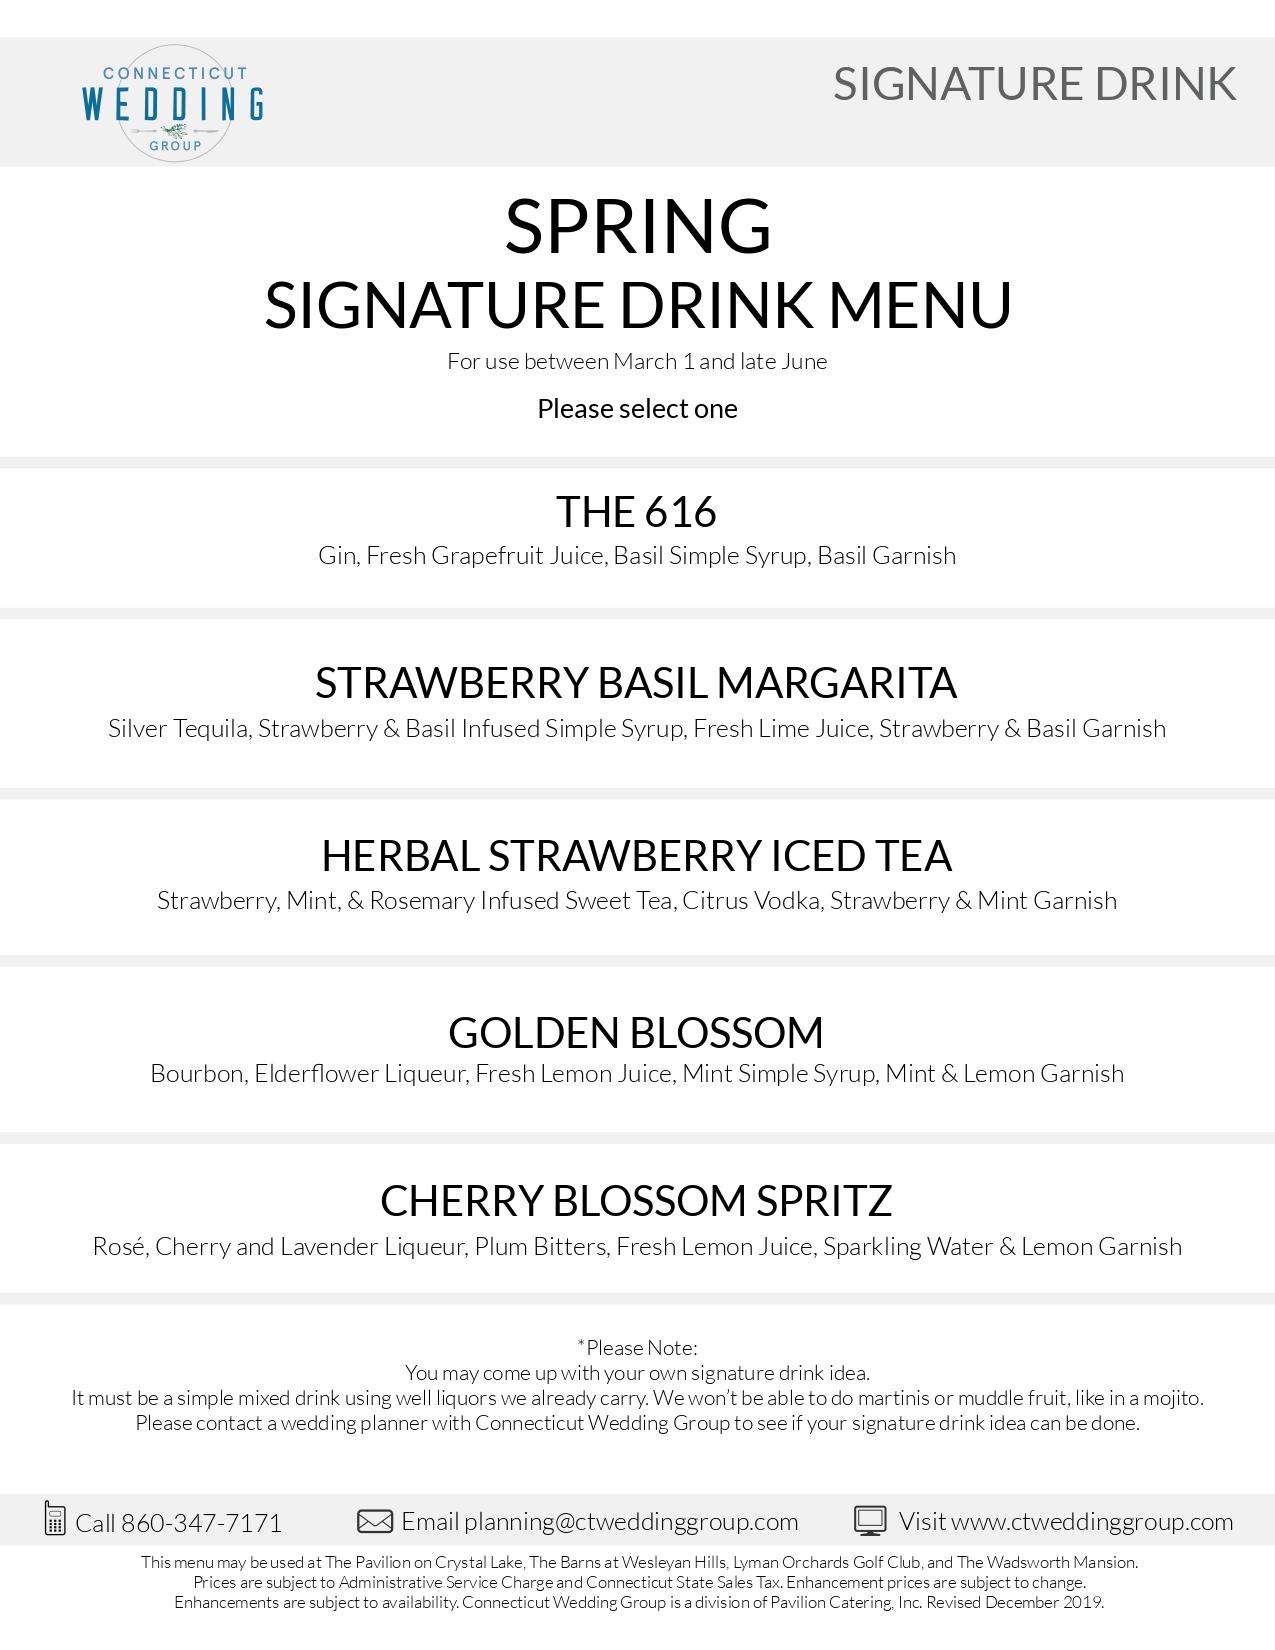 Spring-Signature-Drink-Menu_2022_page-0001